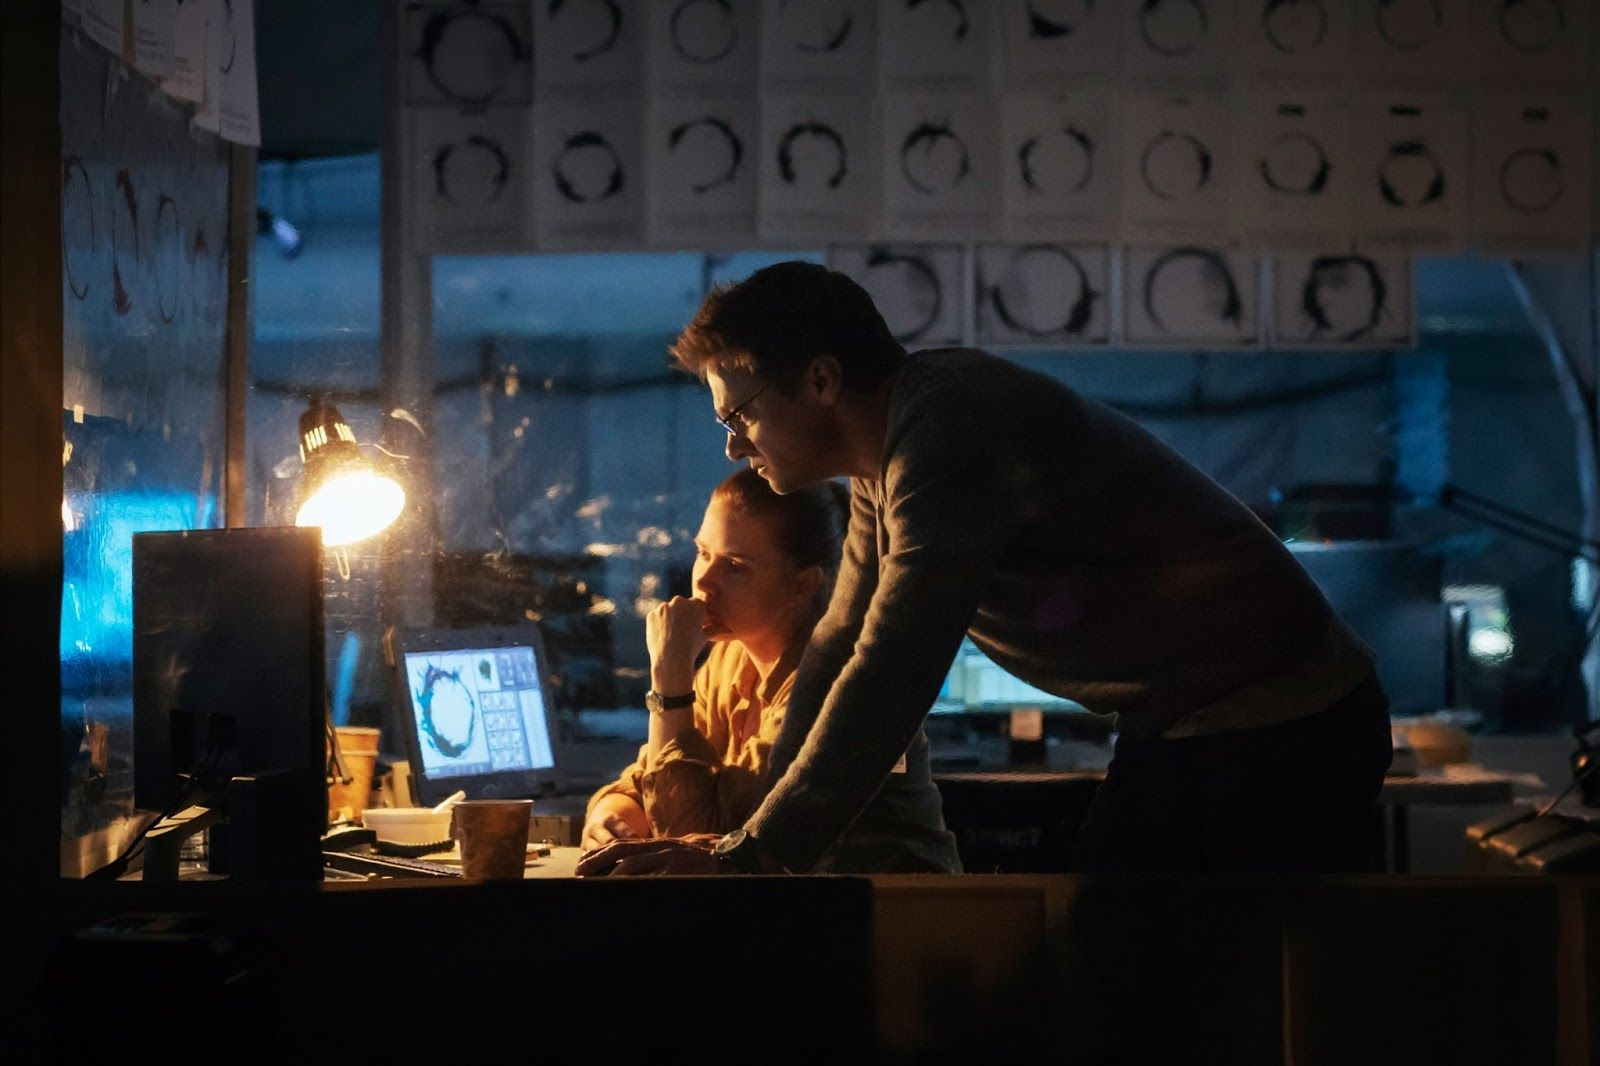 Movie Review: Arrival http://www.datelinemovies.com/2017/03/movie-review-arrival.html  #AmyAdams #JeremyRenner  #ForestWhitaker #MichaelStuhlbarg #Arrival #DenisVillienueve #Alien #Heptapods #MovieReview